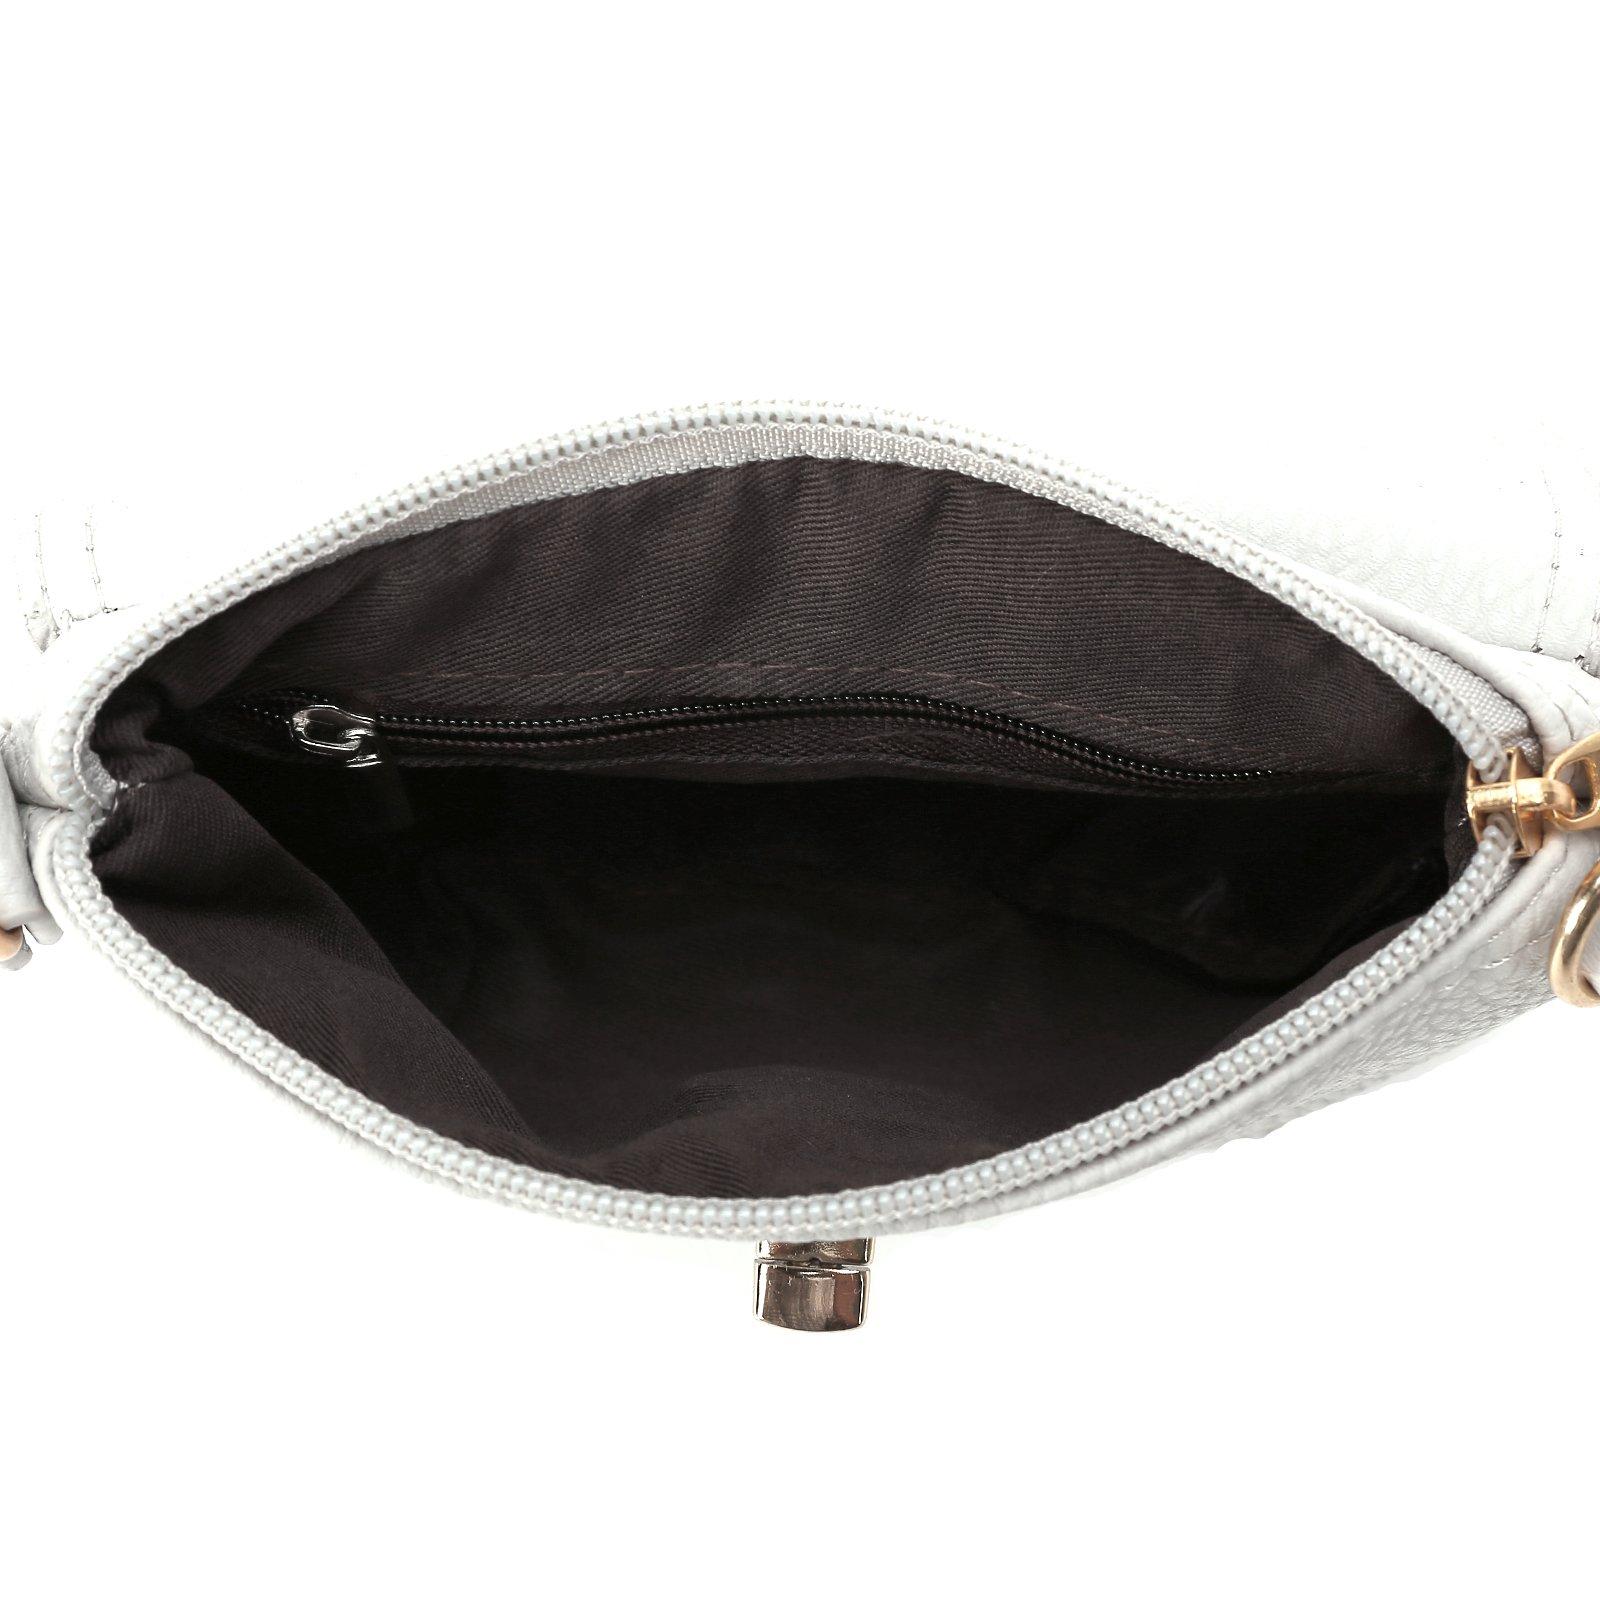 Ladies Mini SMALL Handbag Envelope Crossbody Shoulder Messenger Totes Bag Purse by Anladia (Image #4)